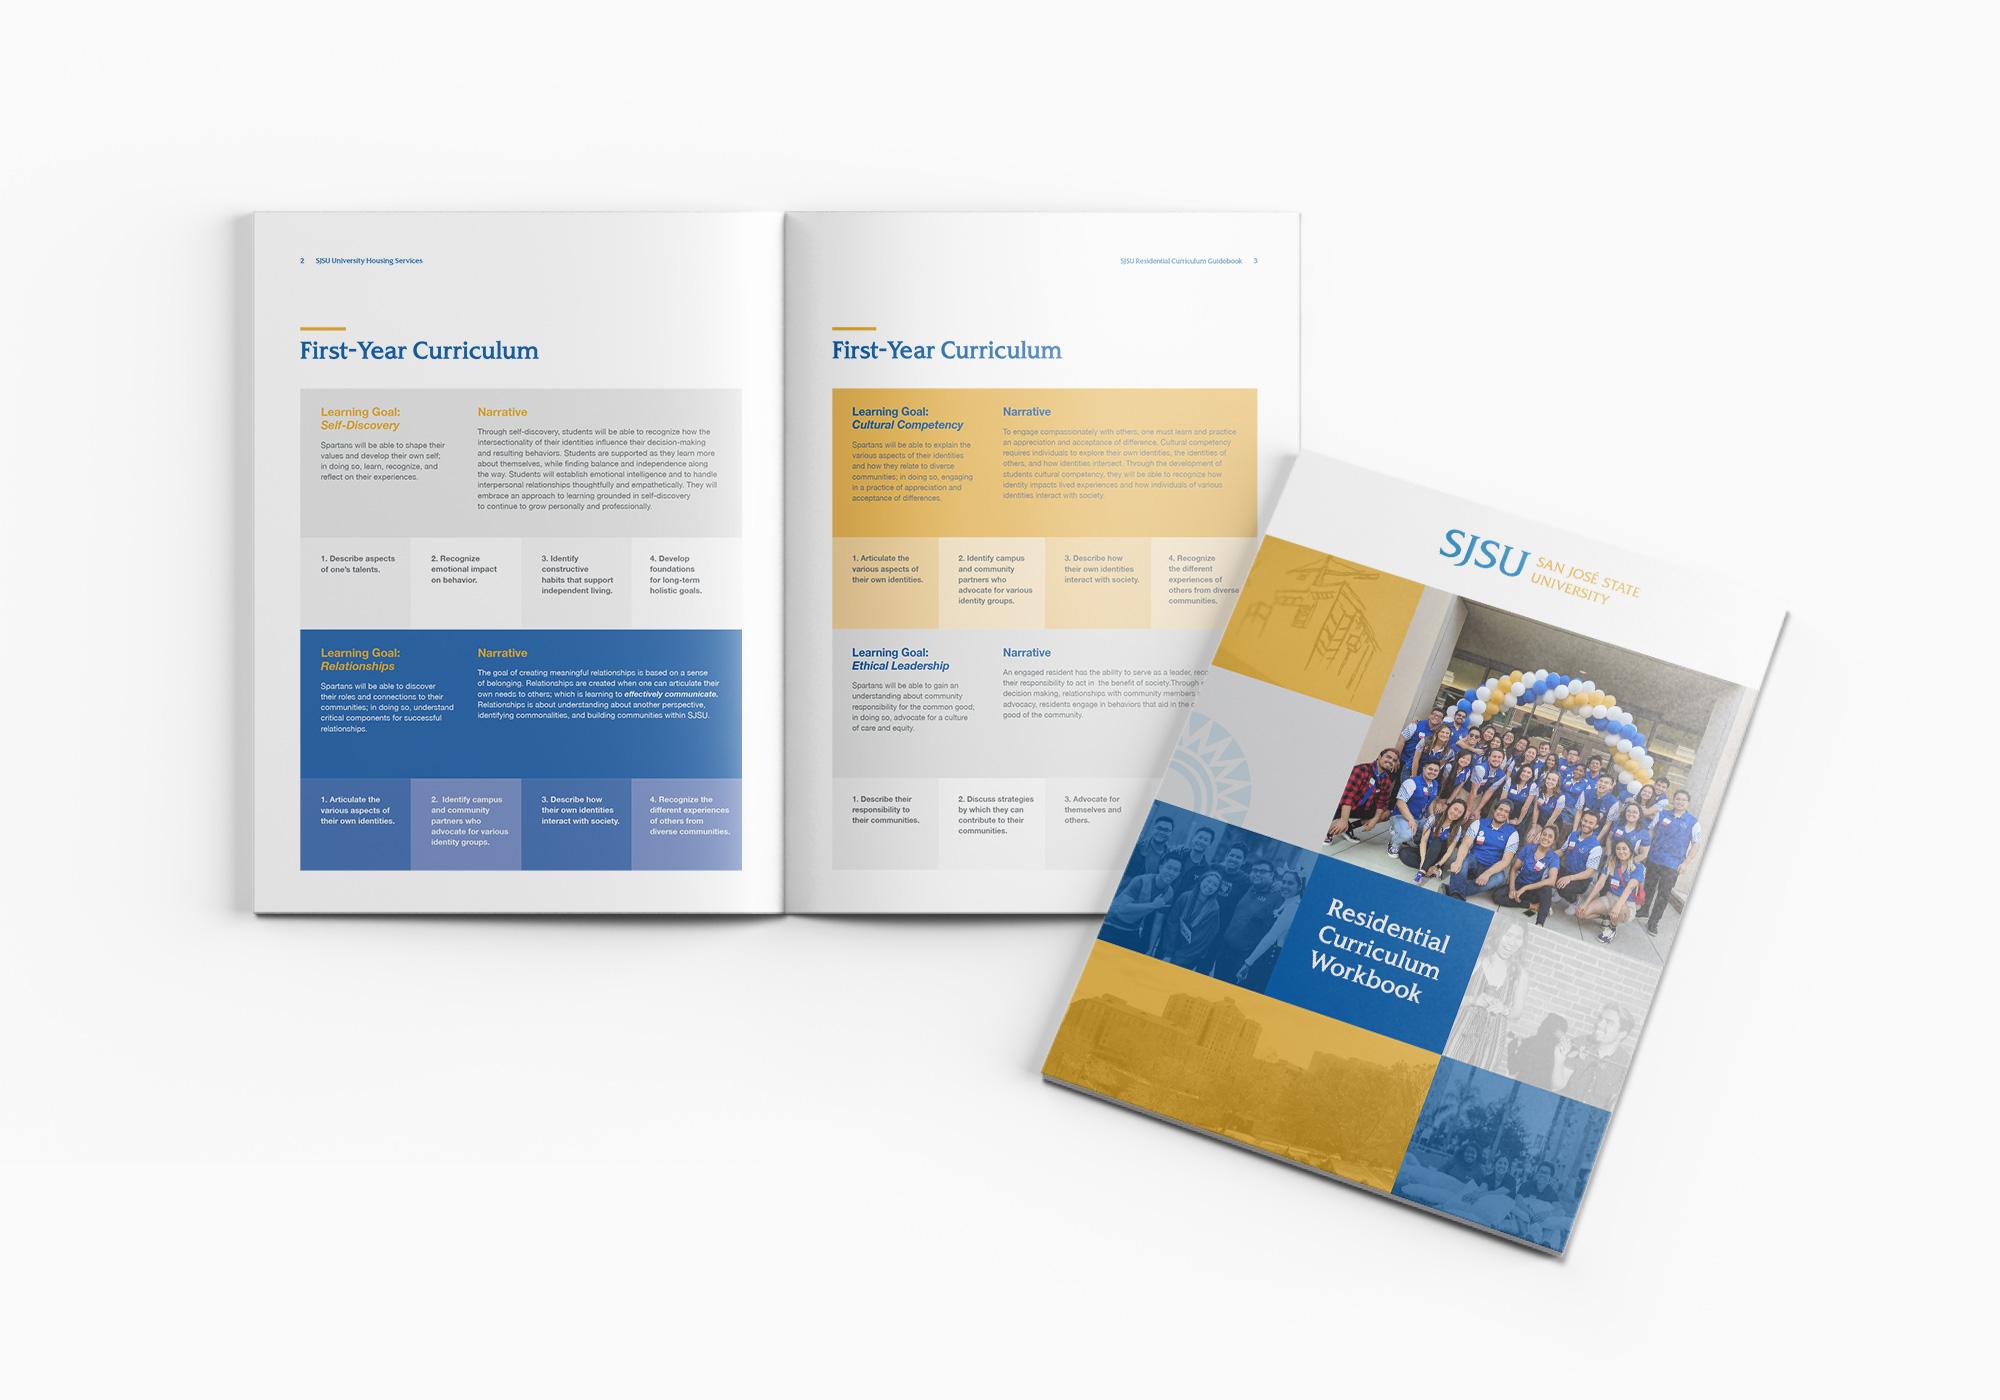 SJSU Residential Workbook